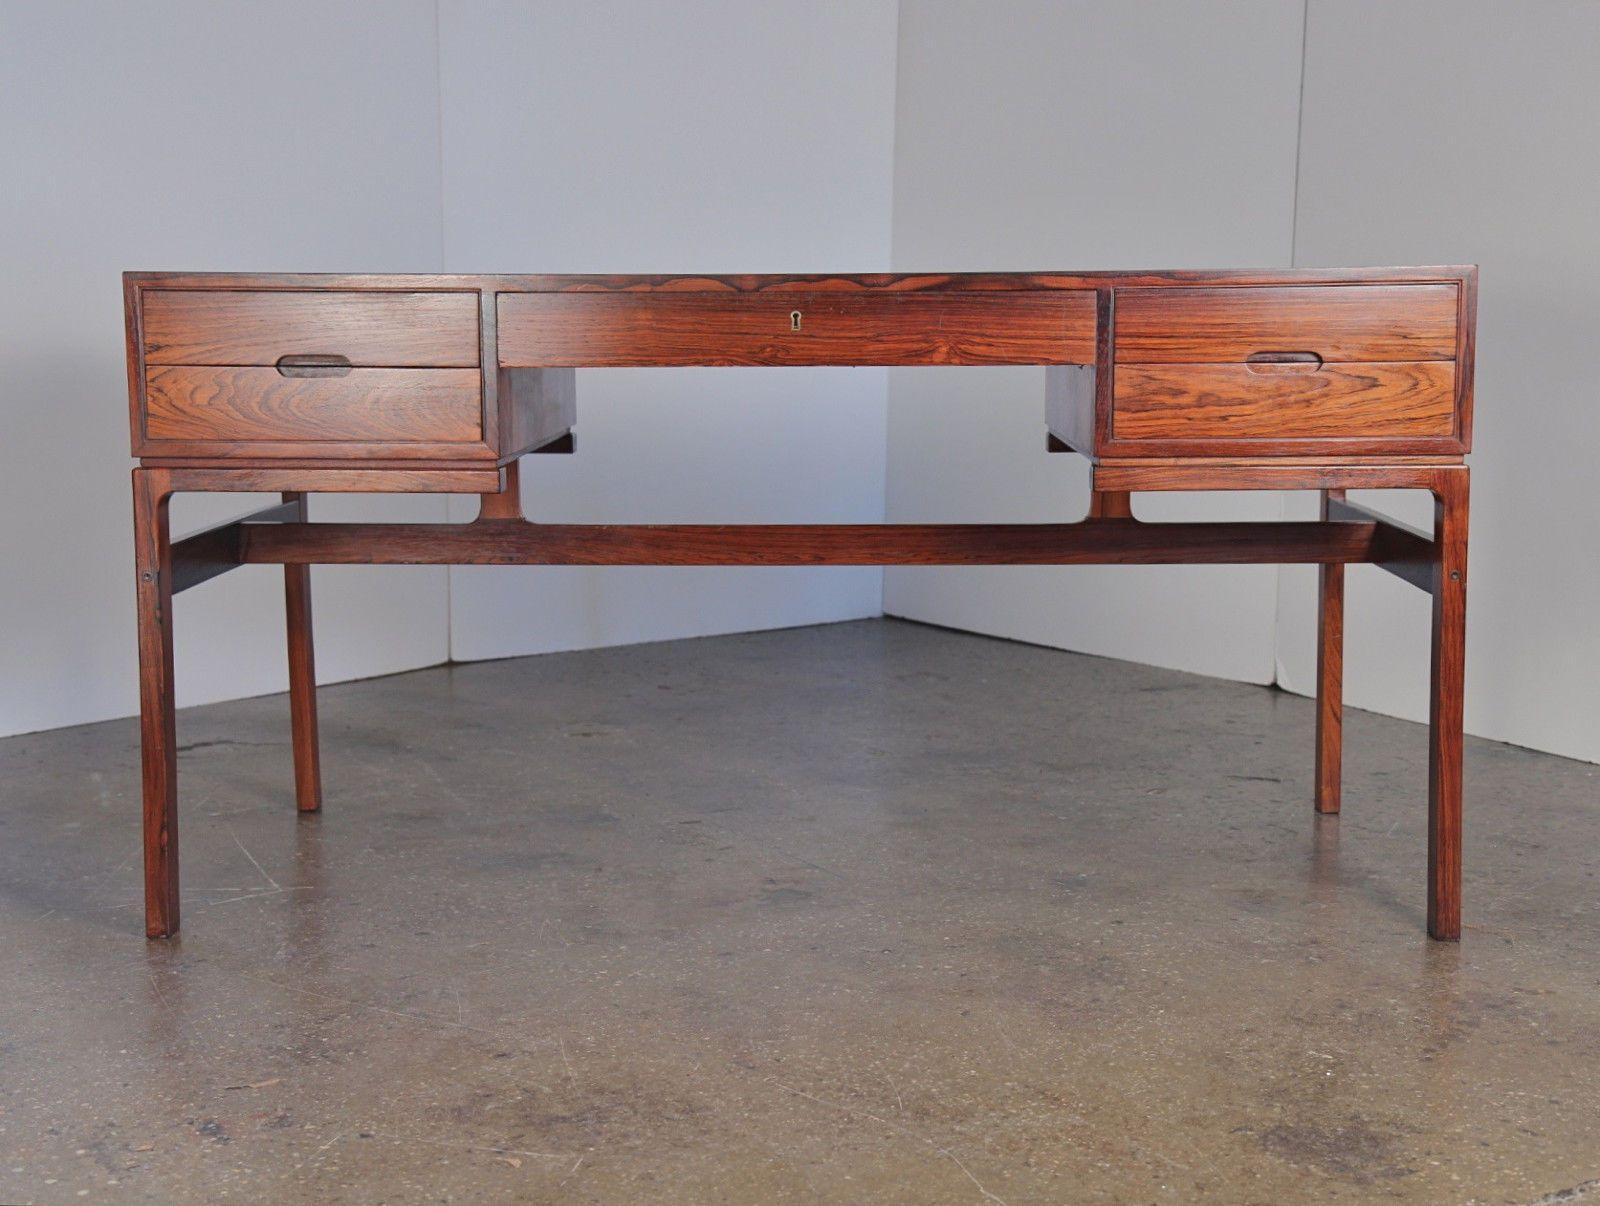 wahl iversen rosewood desk danish modern writing table sleek design - arne wahl iversen rosewood desk danish modern writing table sleek design